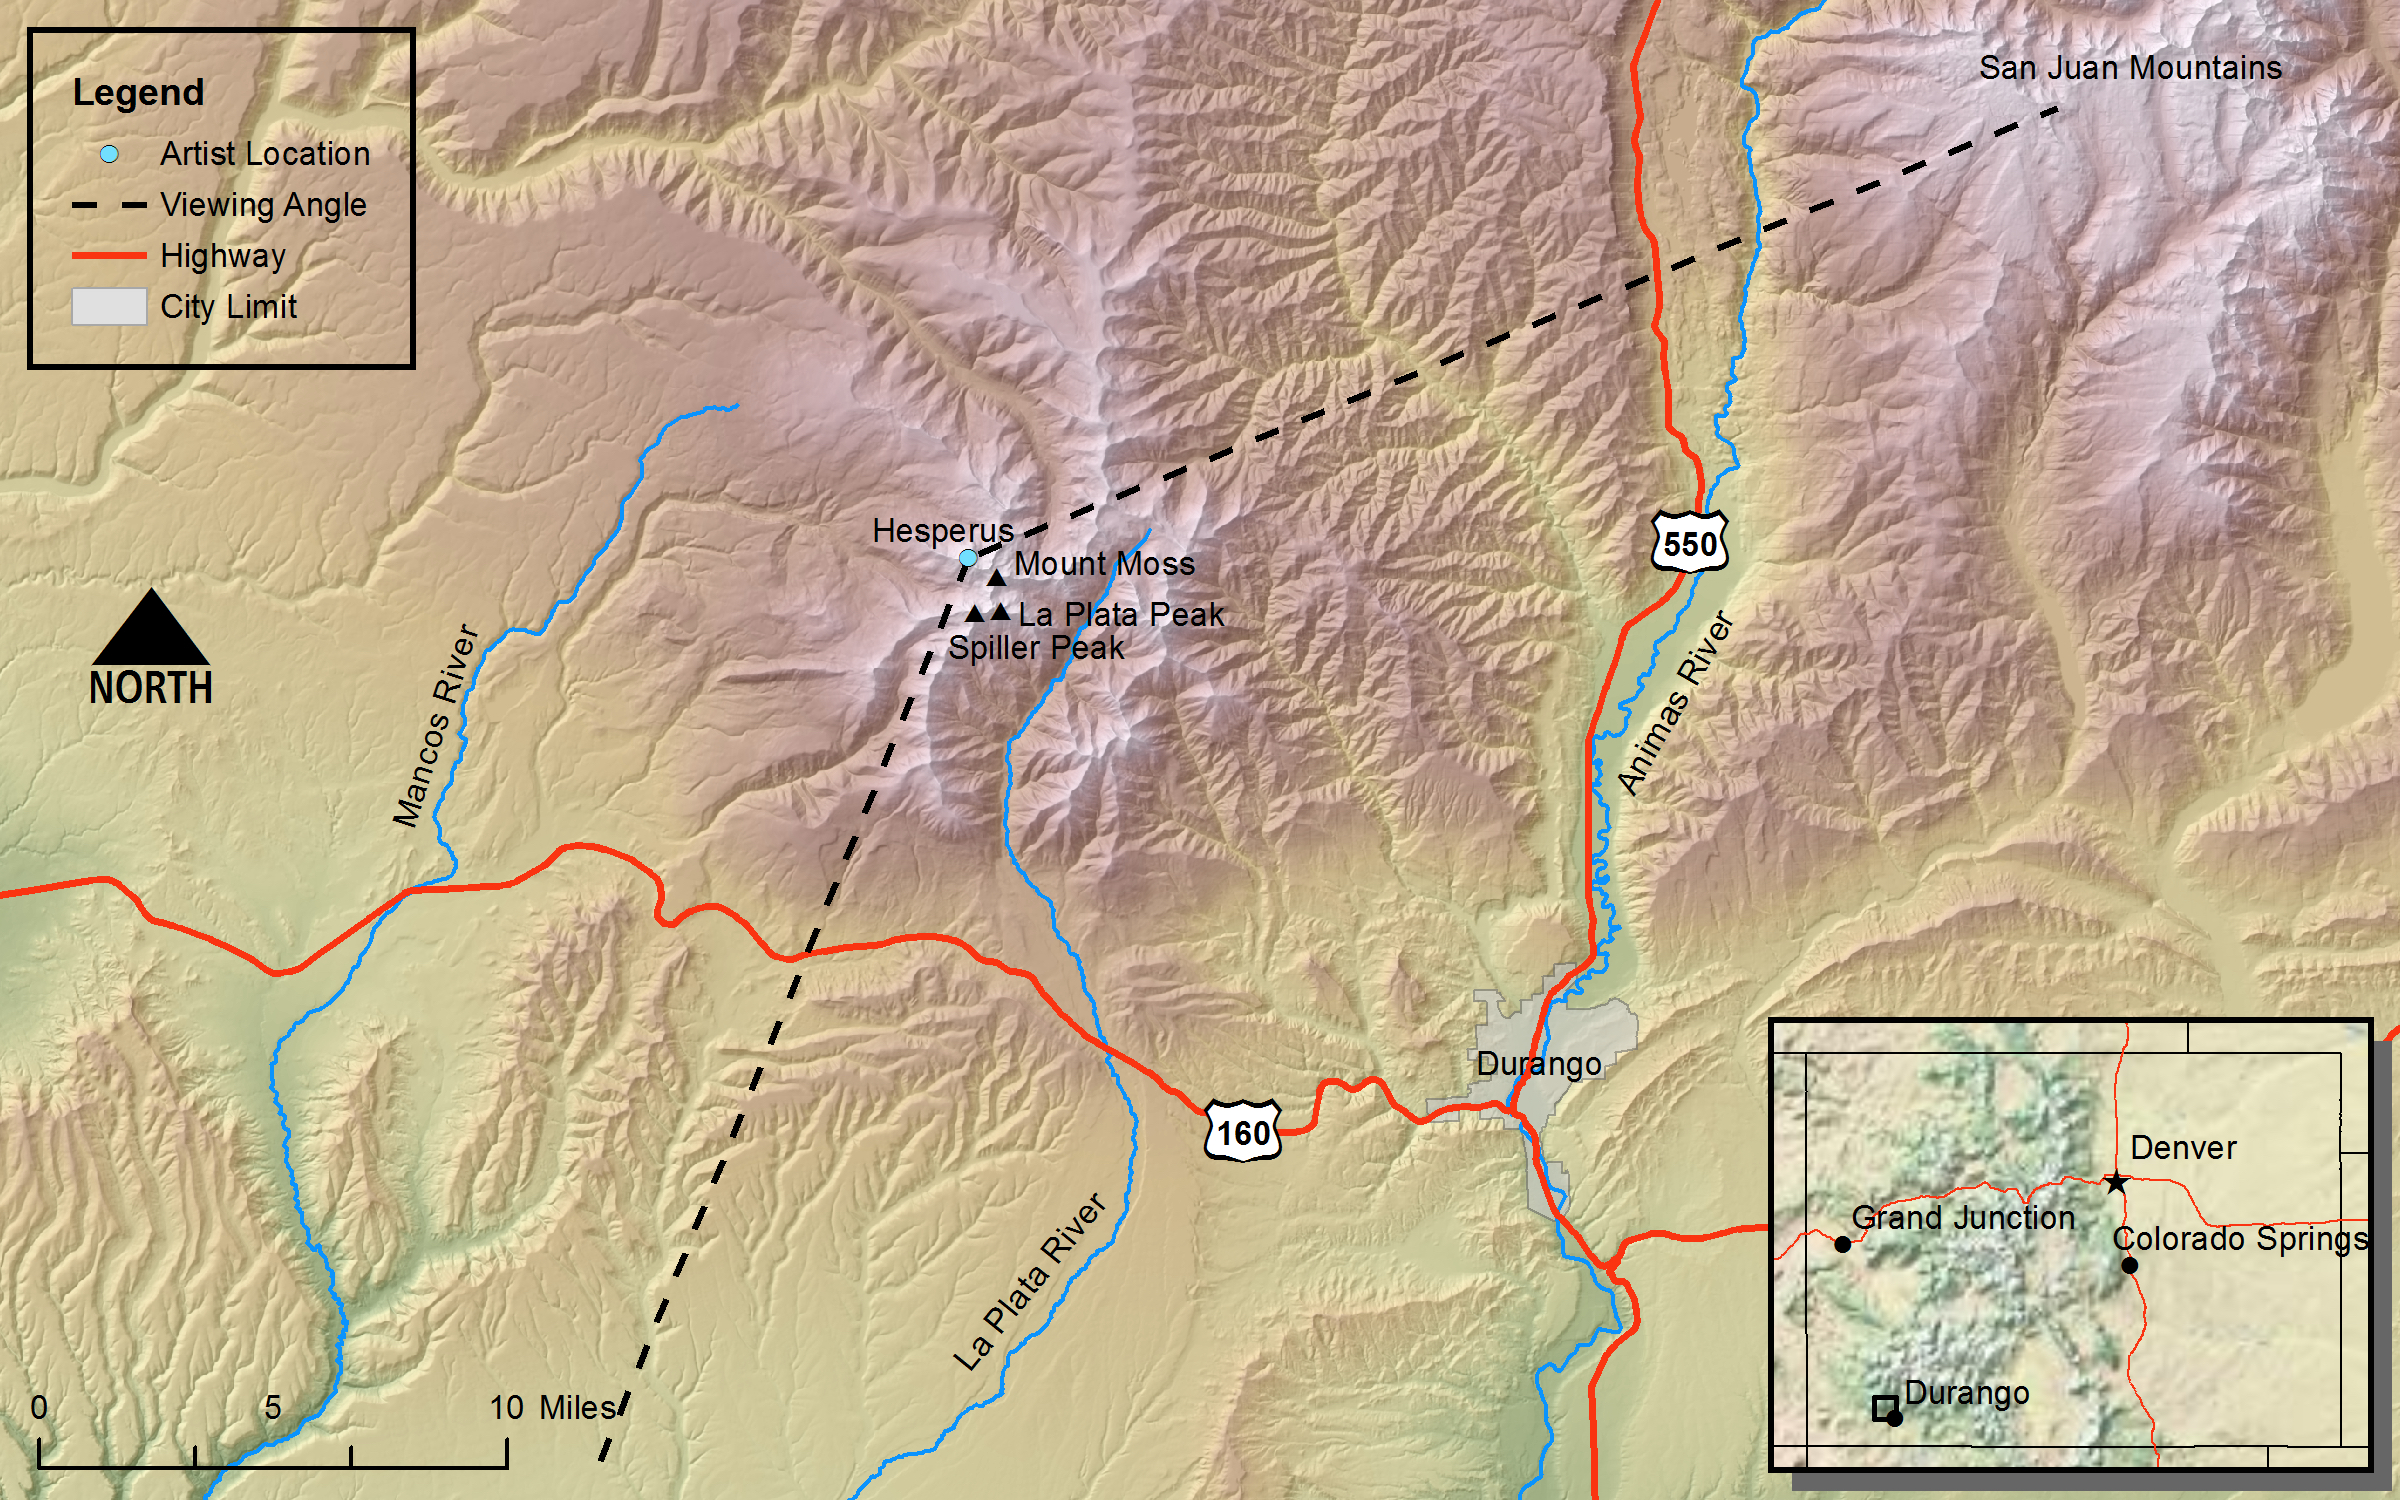 Hayden\'s Landscapes Revisited - Hesperus Mountain